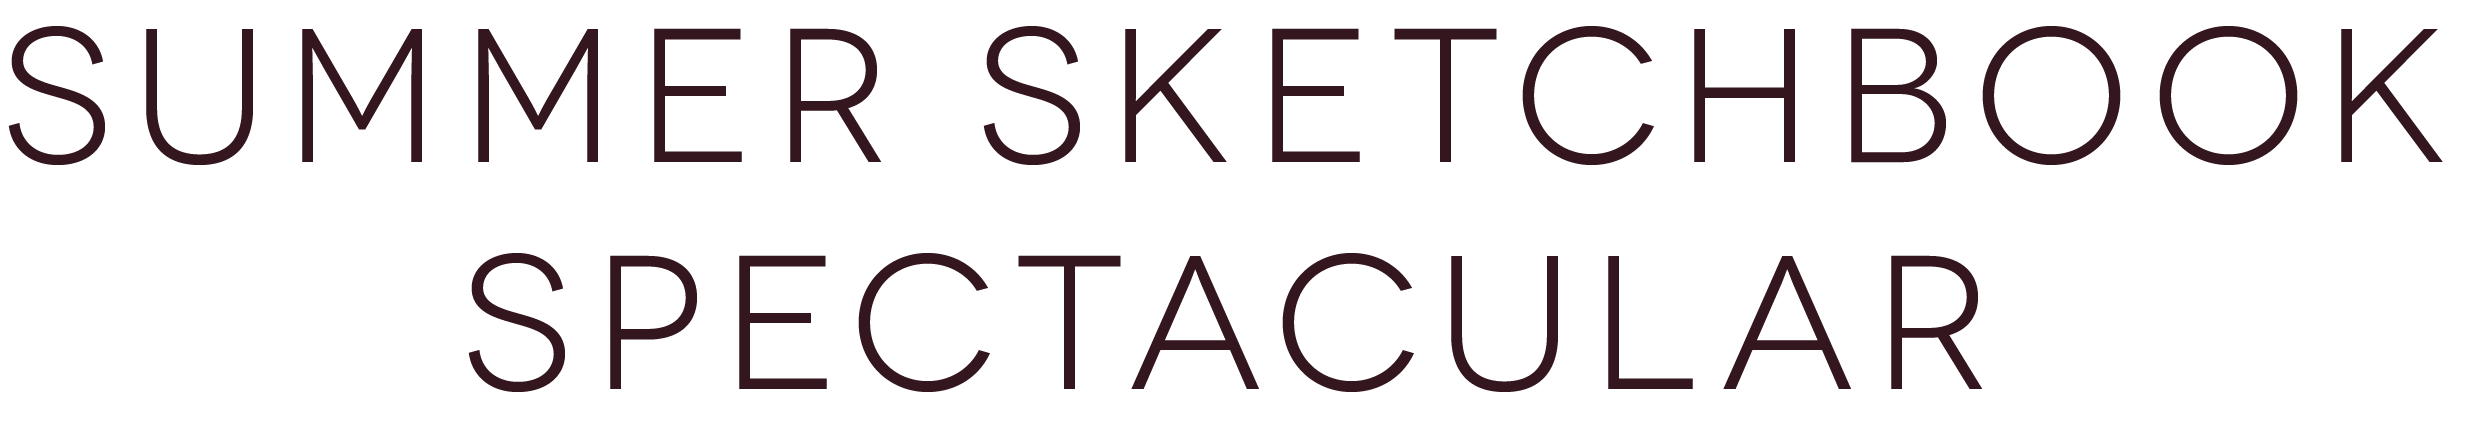 summersketchbook2.png